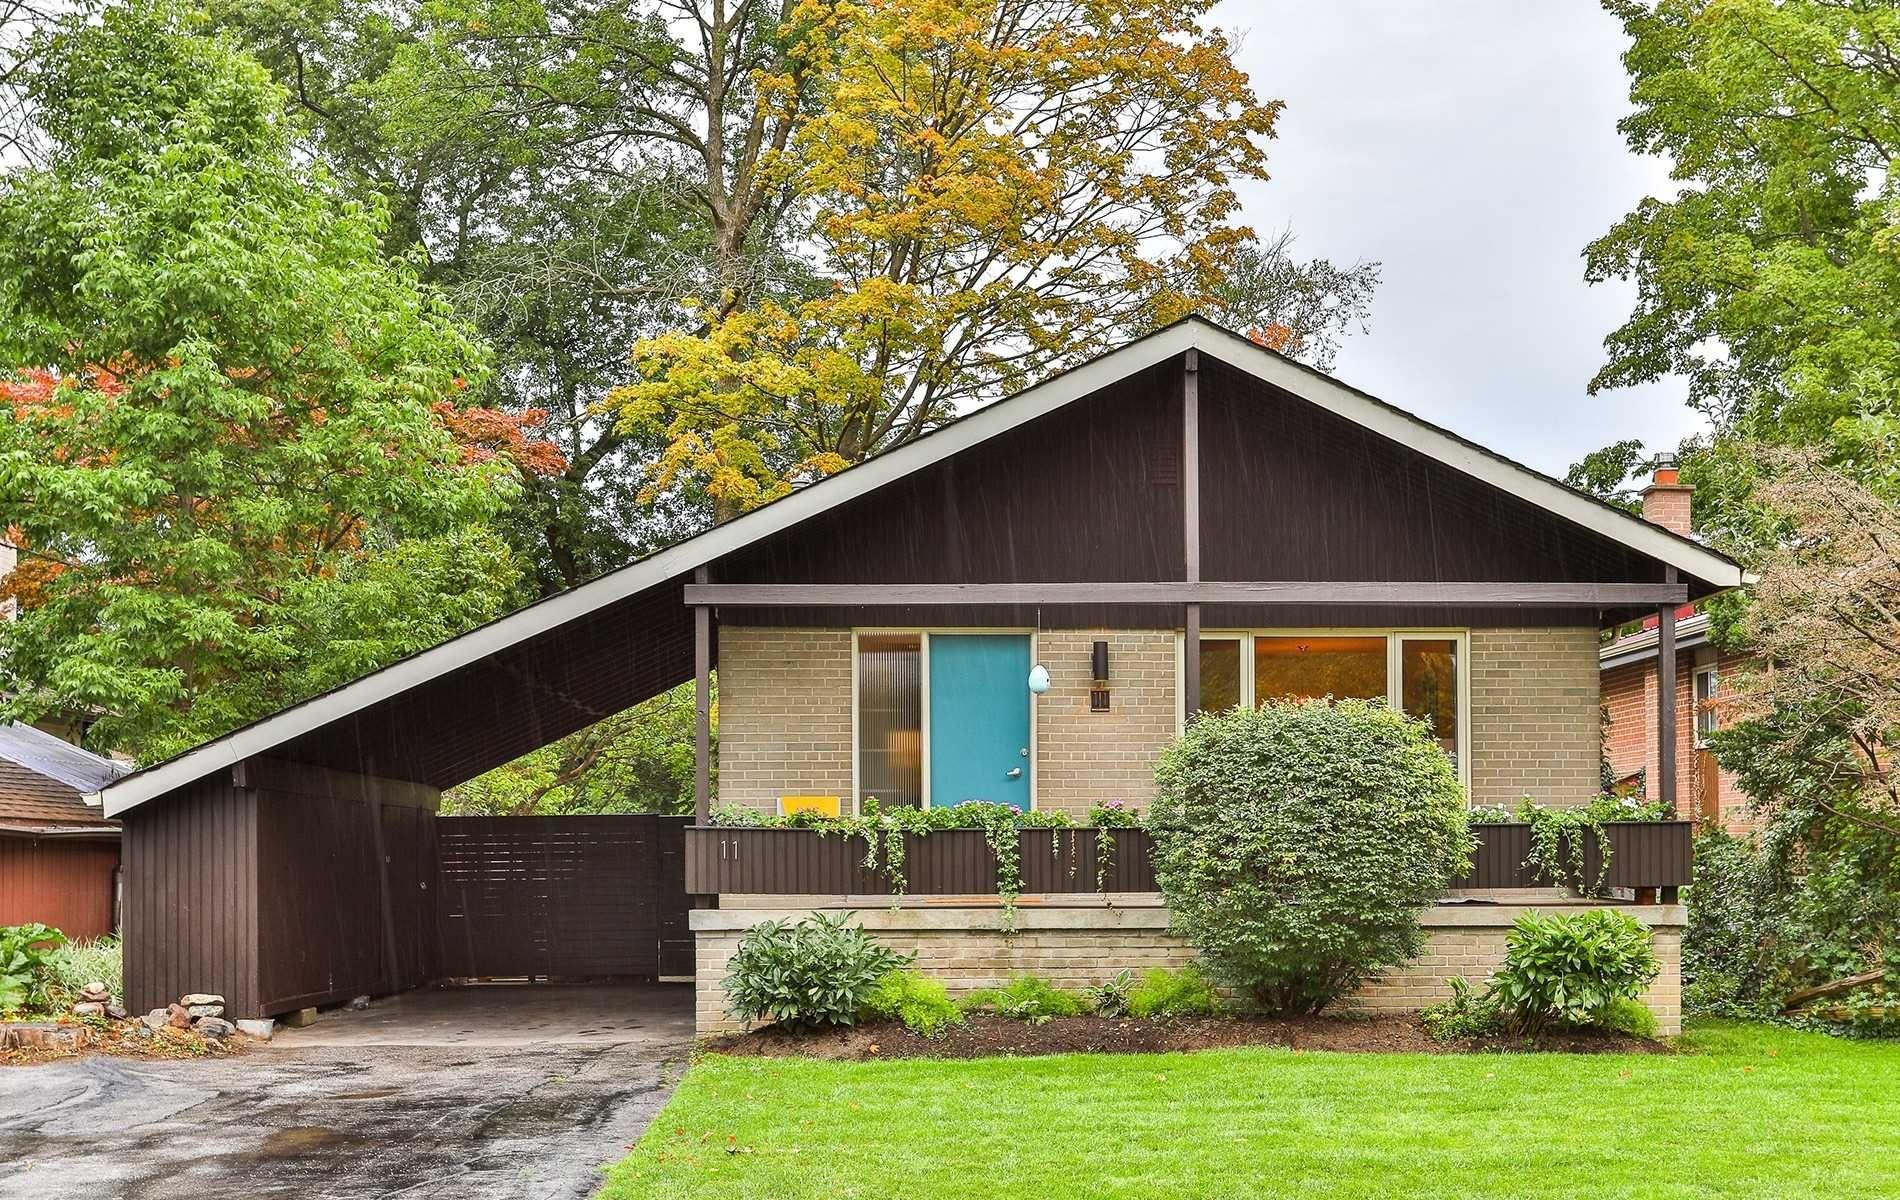 Main Photo: 11 Forsythia Dr in Toronto: Guildwood Freehold for sale (Toronto E08)  : MLS®# E4572181